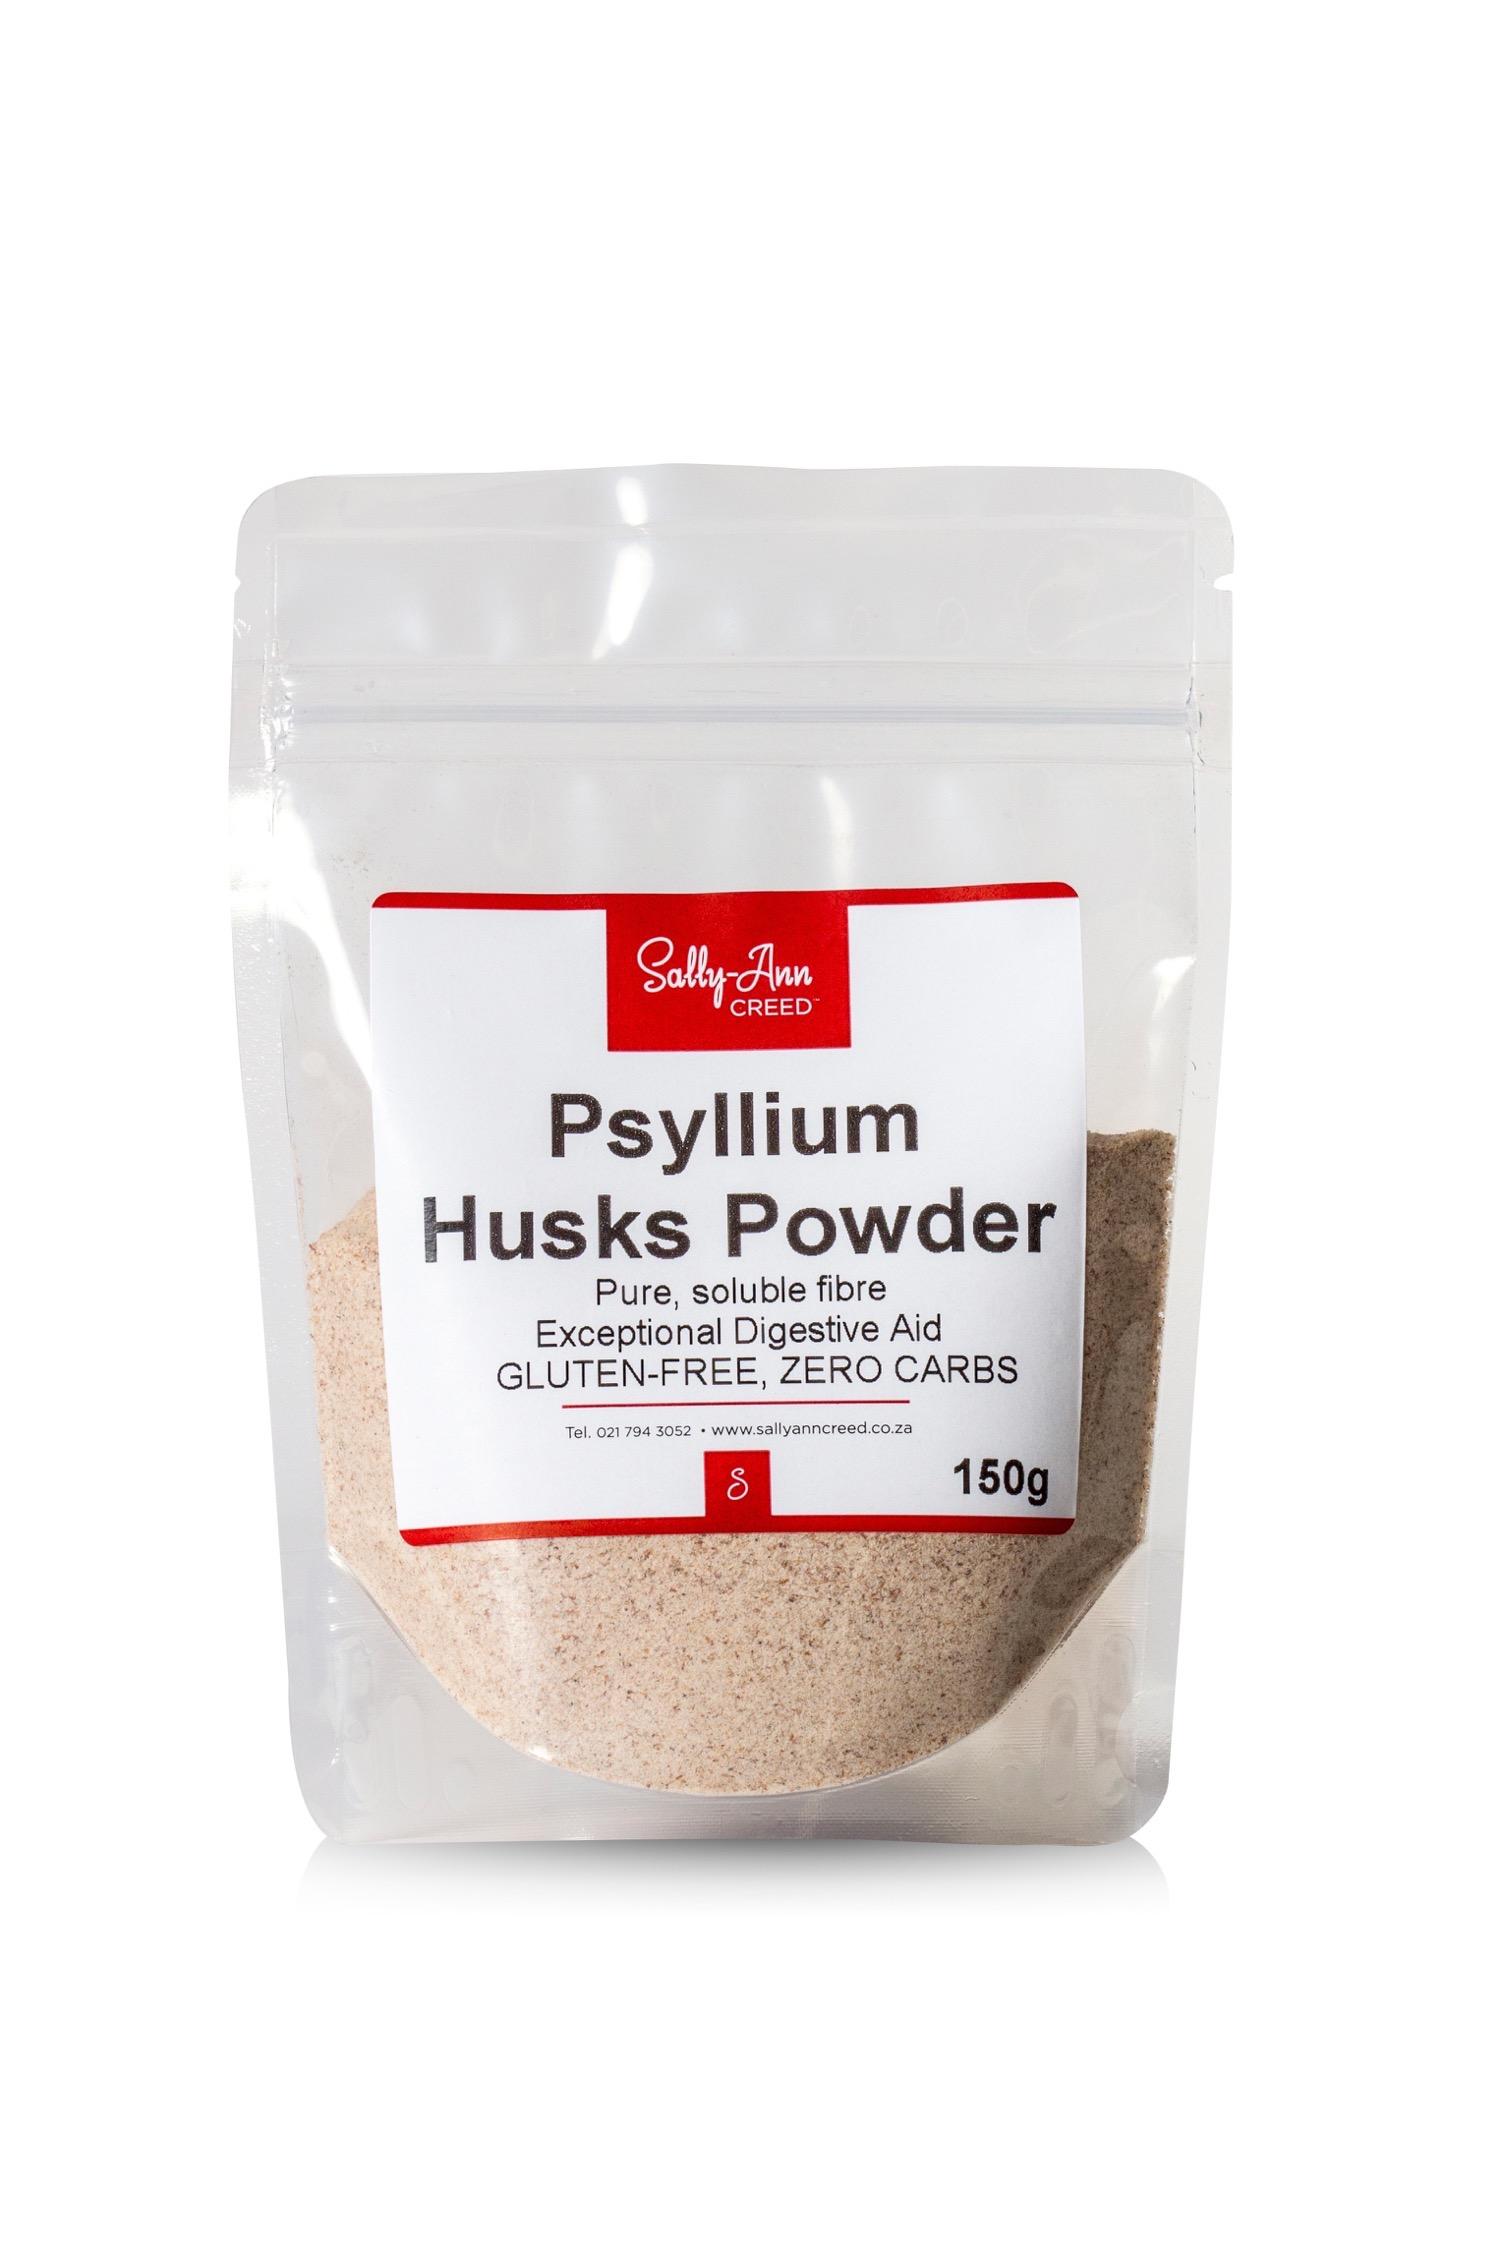 Organic Psyllium Husk Fibre Sally Ann Creed